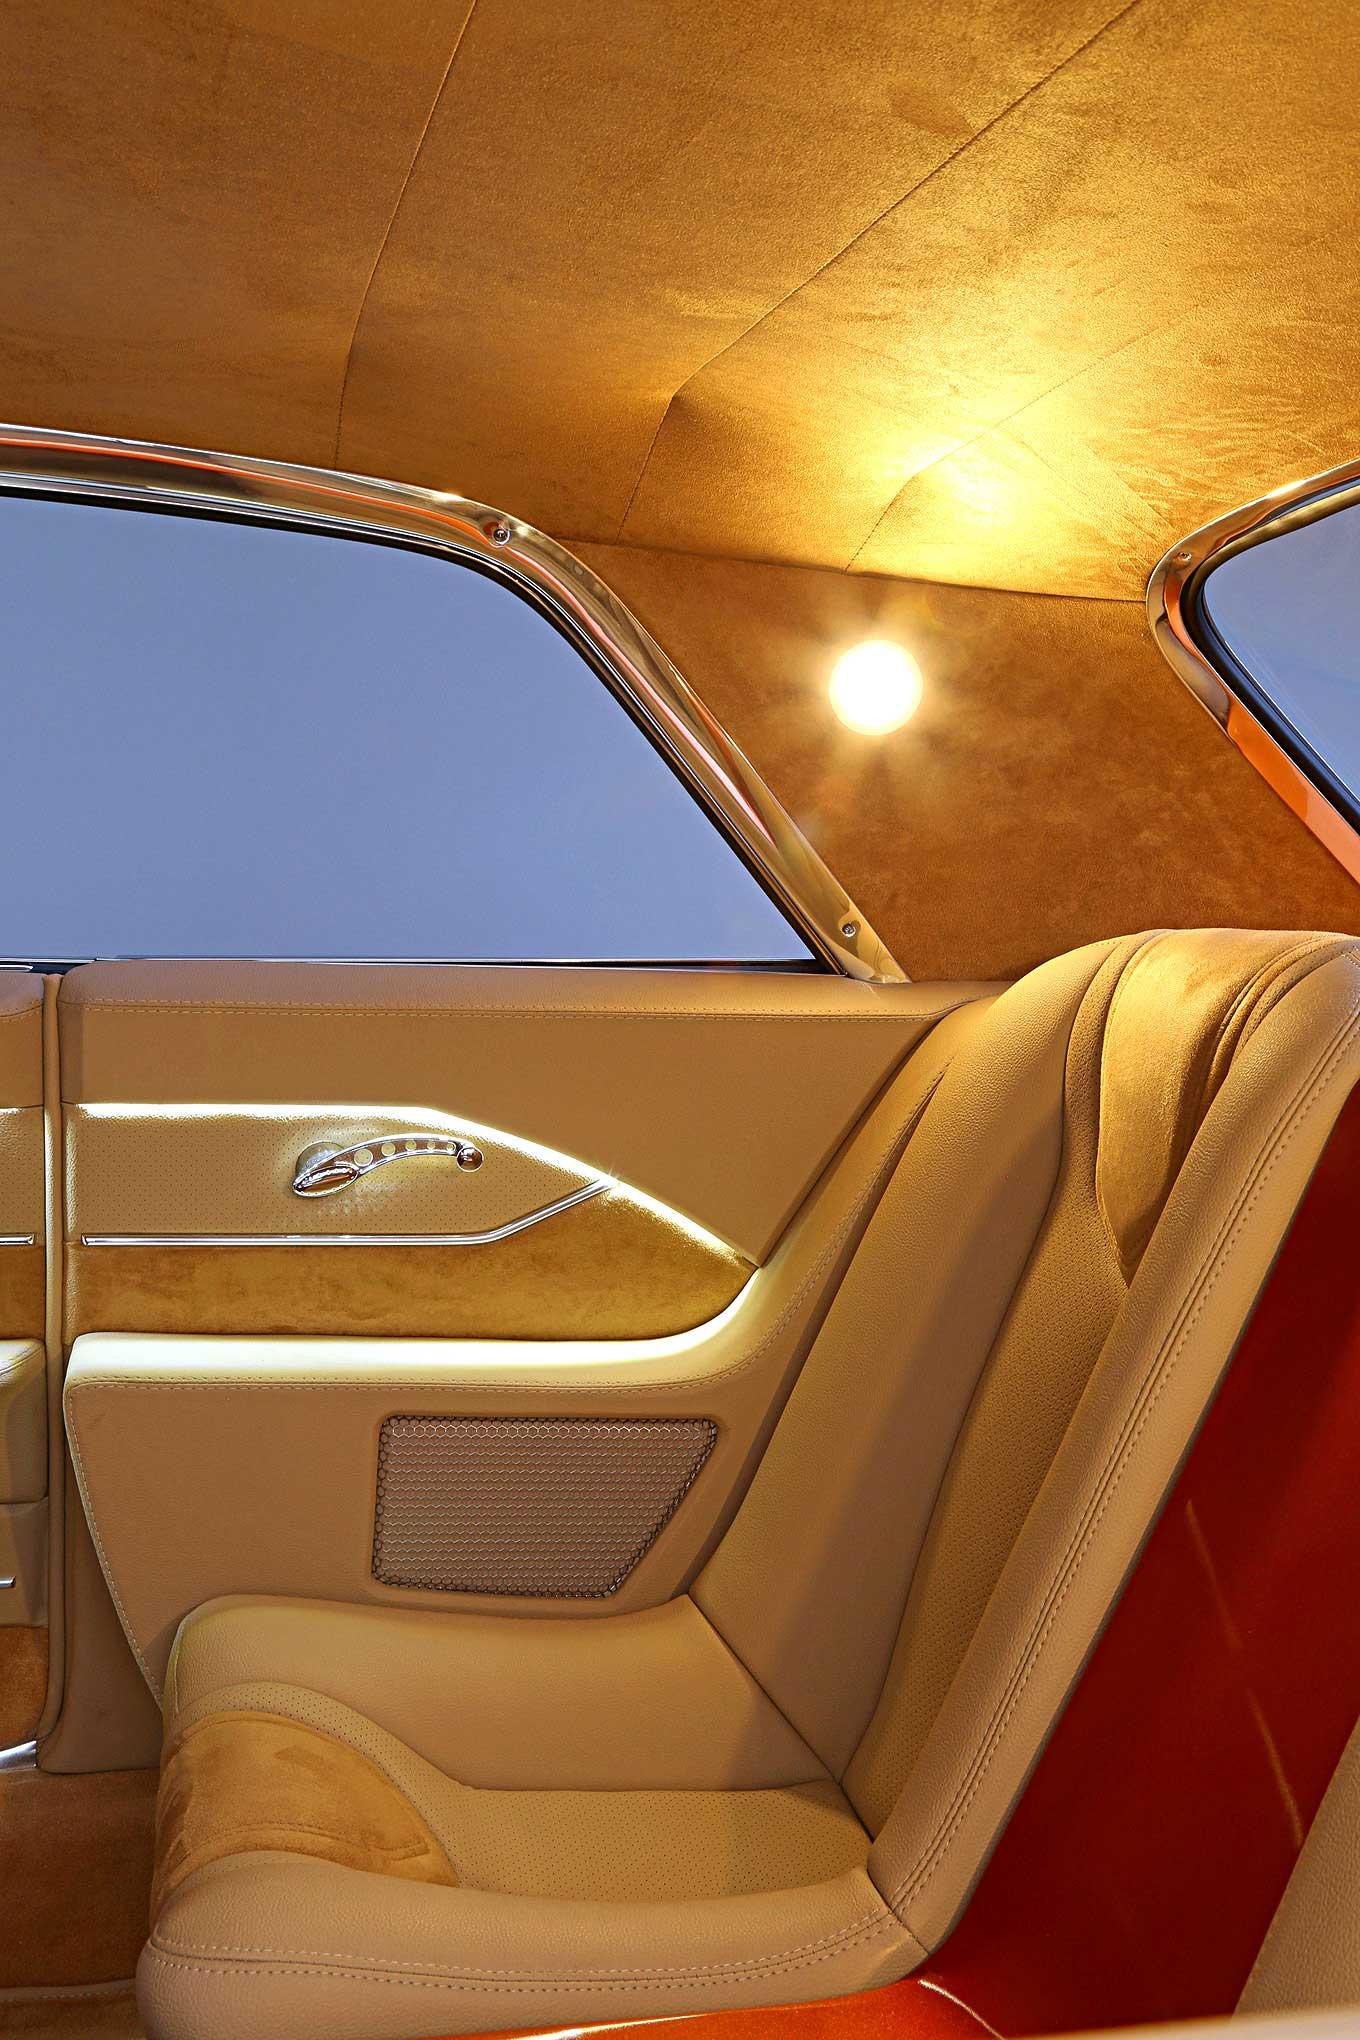 1962 chevrolet impala led interior lights lowrider. Black Bedroom Furniture Sets. Home Design Ideas